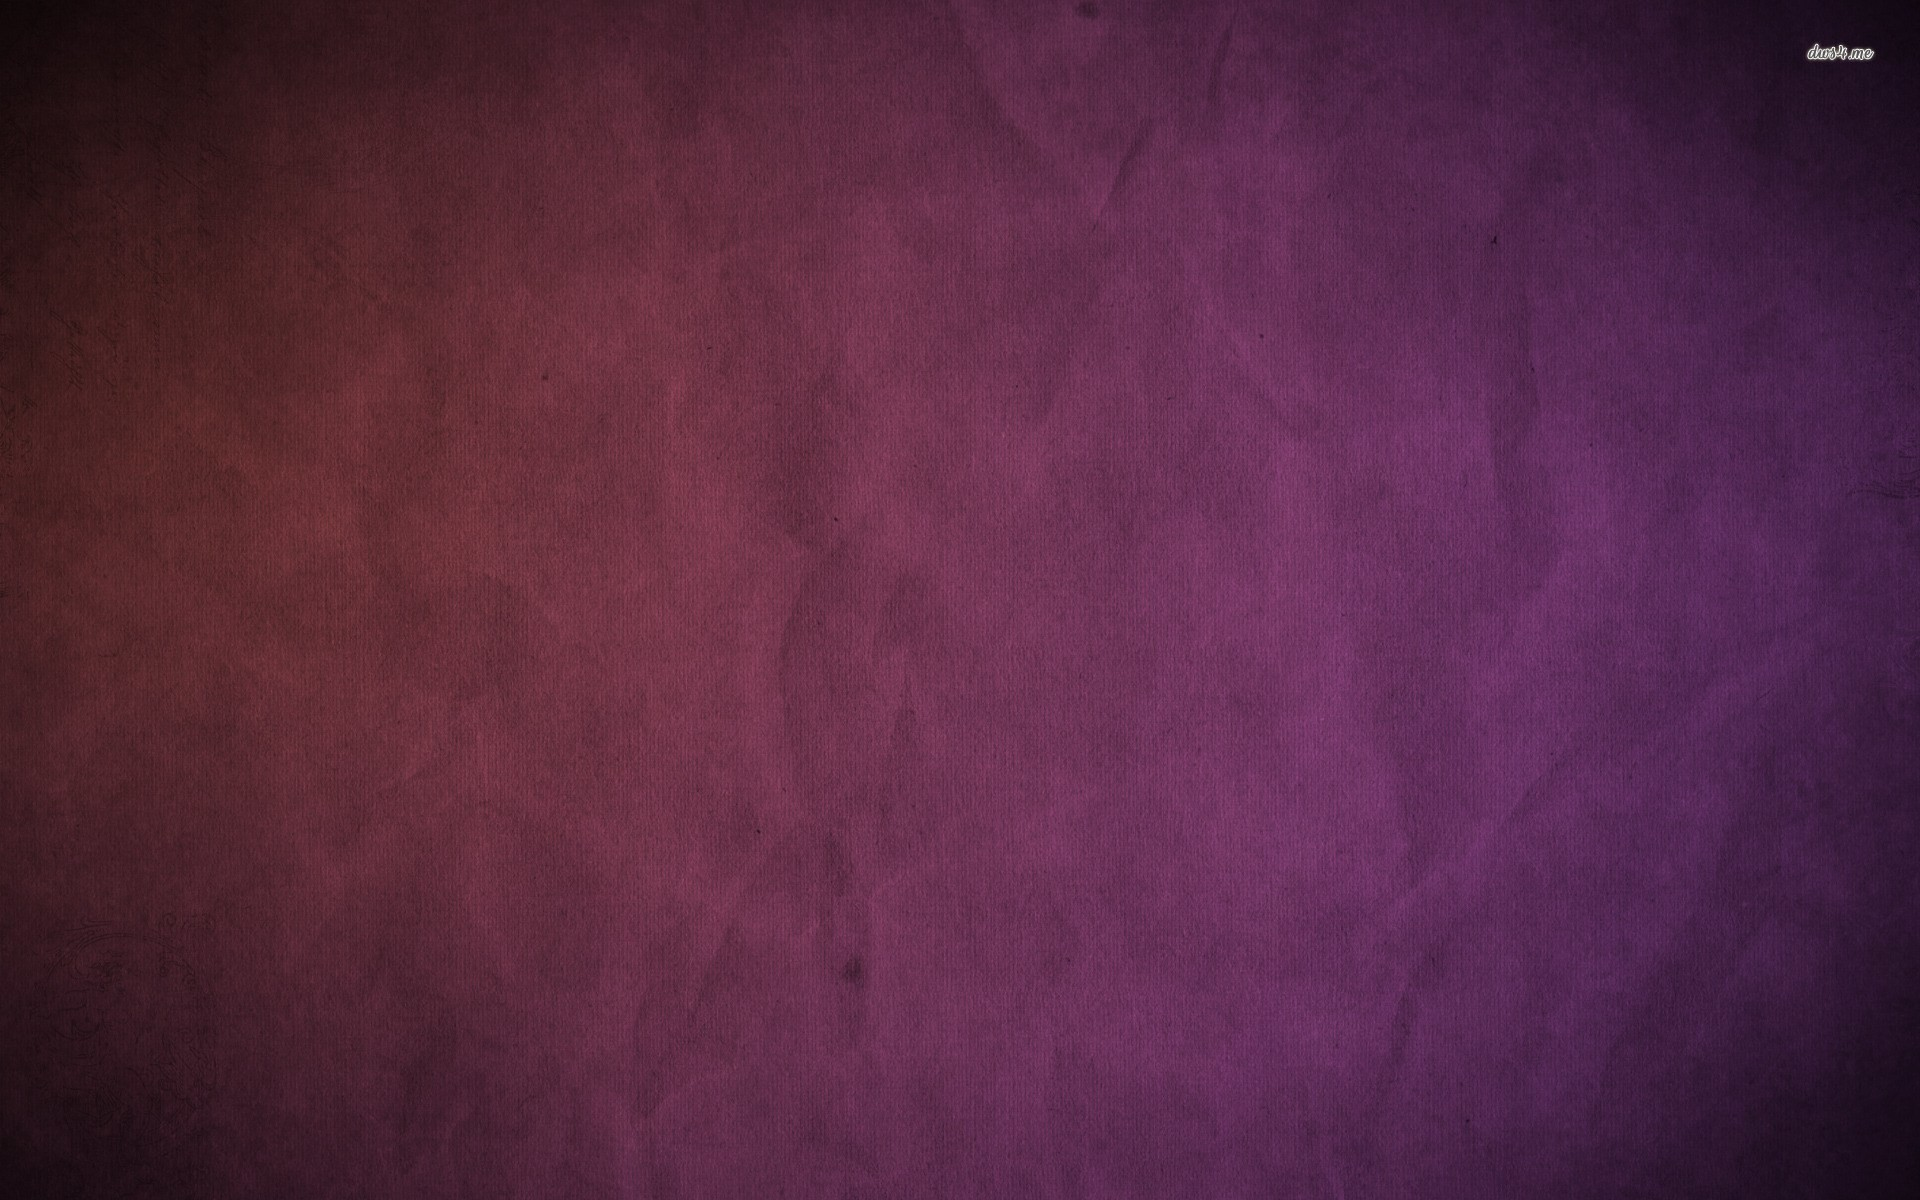 Purple Textures Hd